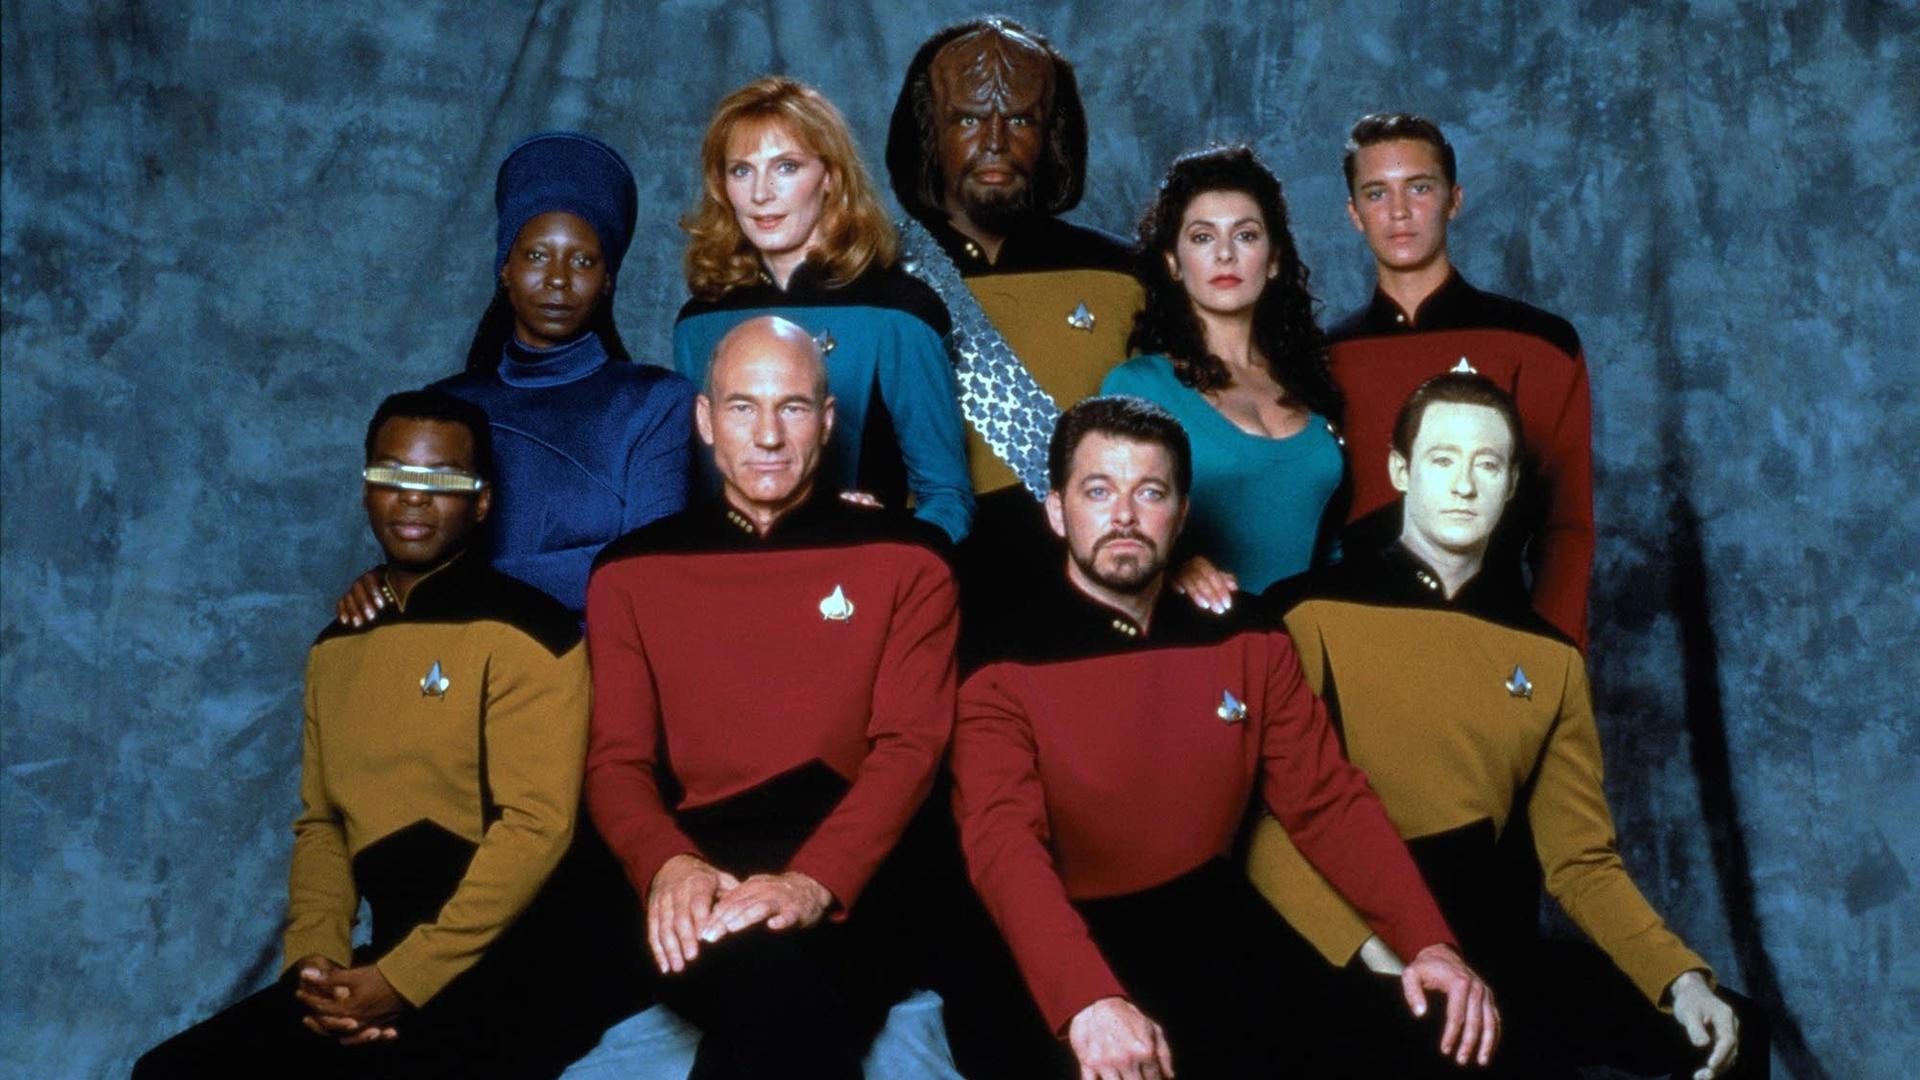 Star Trek: The Next Generation Gag Reels